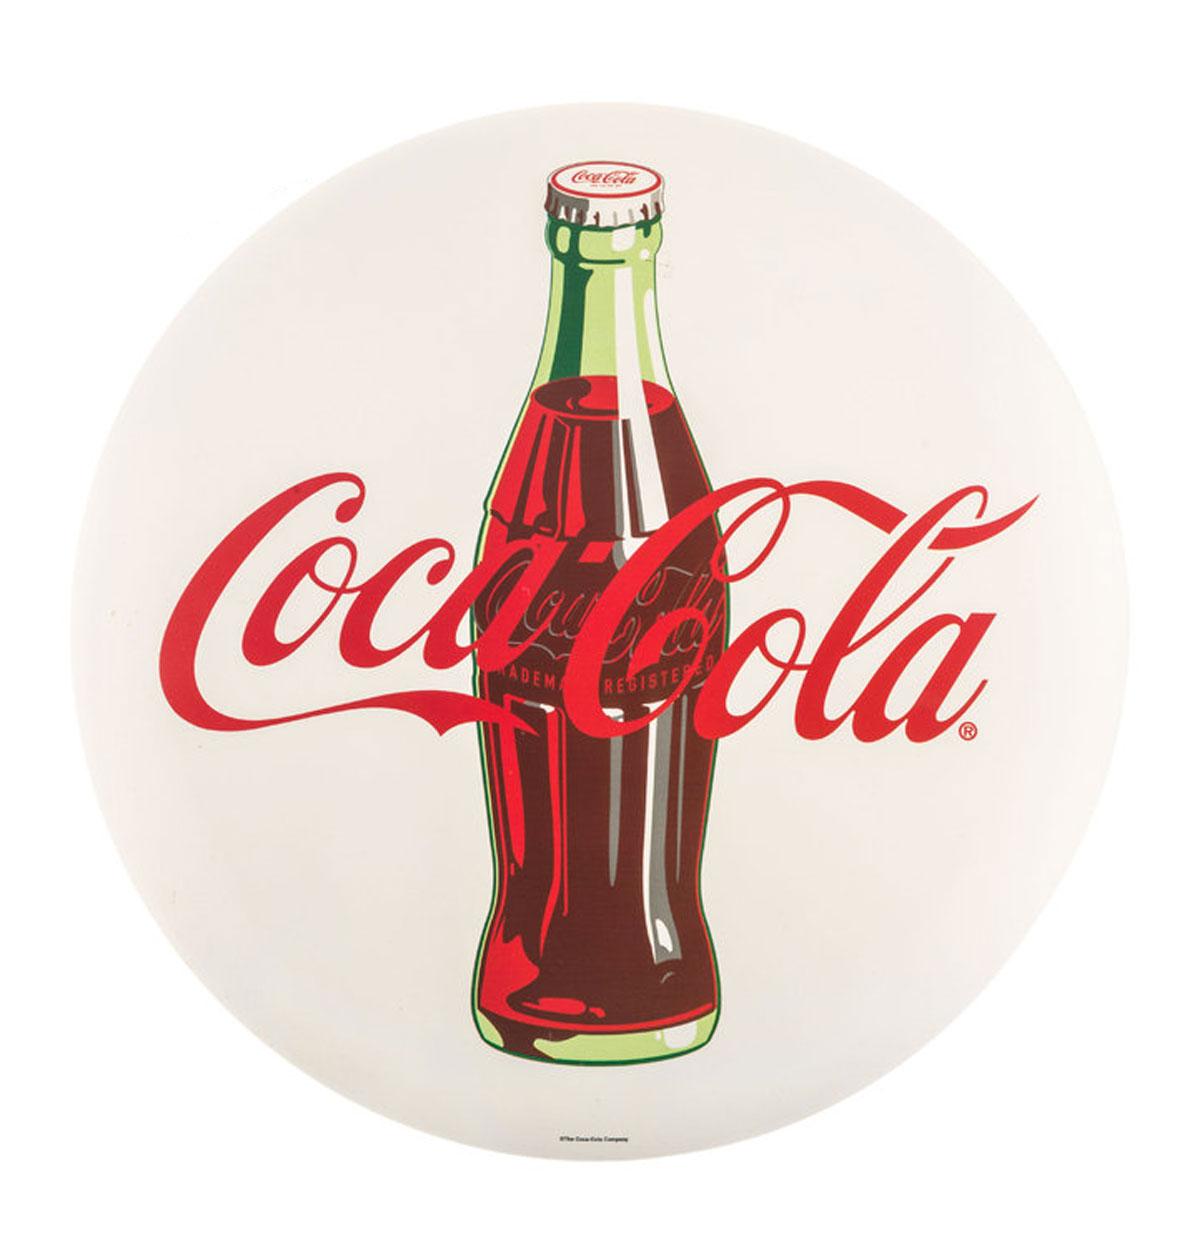 Coca-Cola Rond Metalen Logo Bord Button Wit